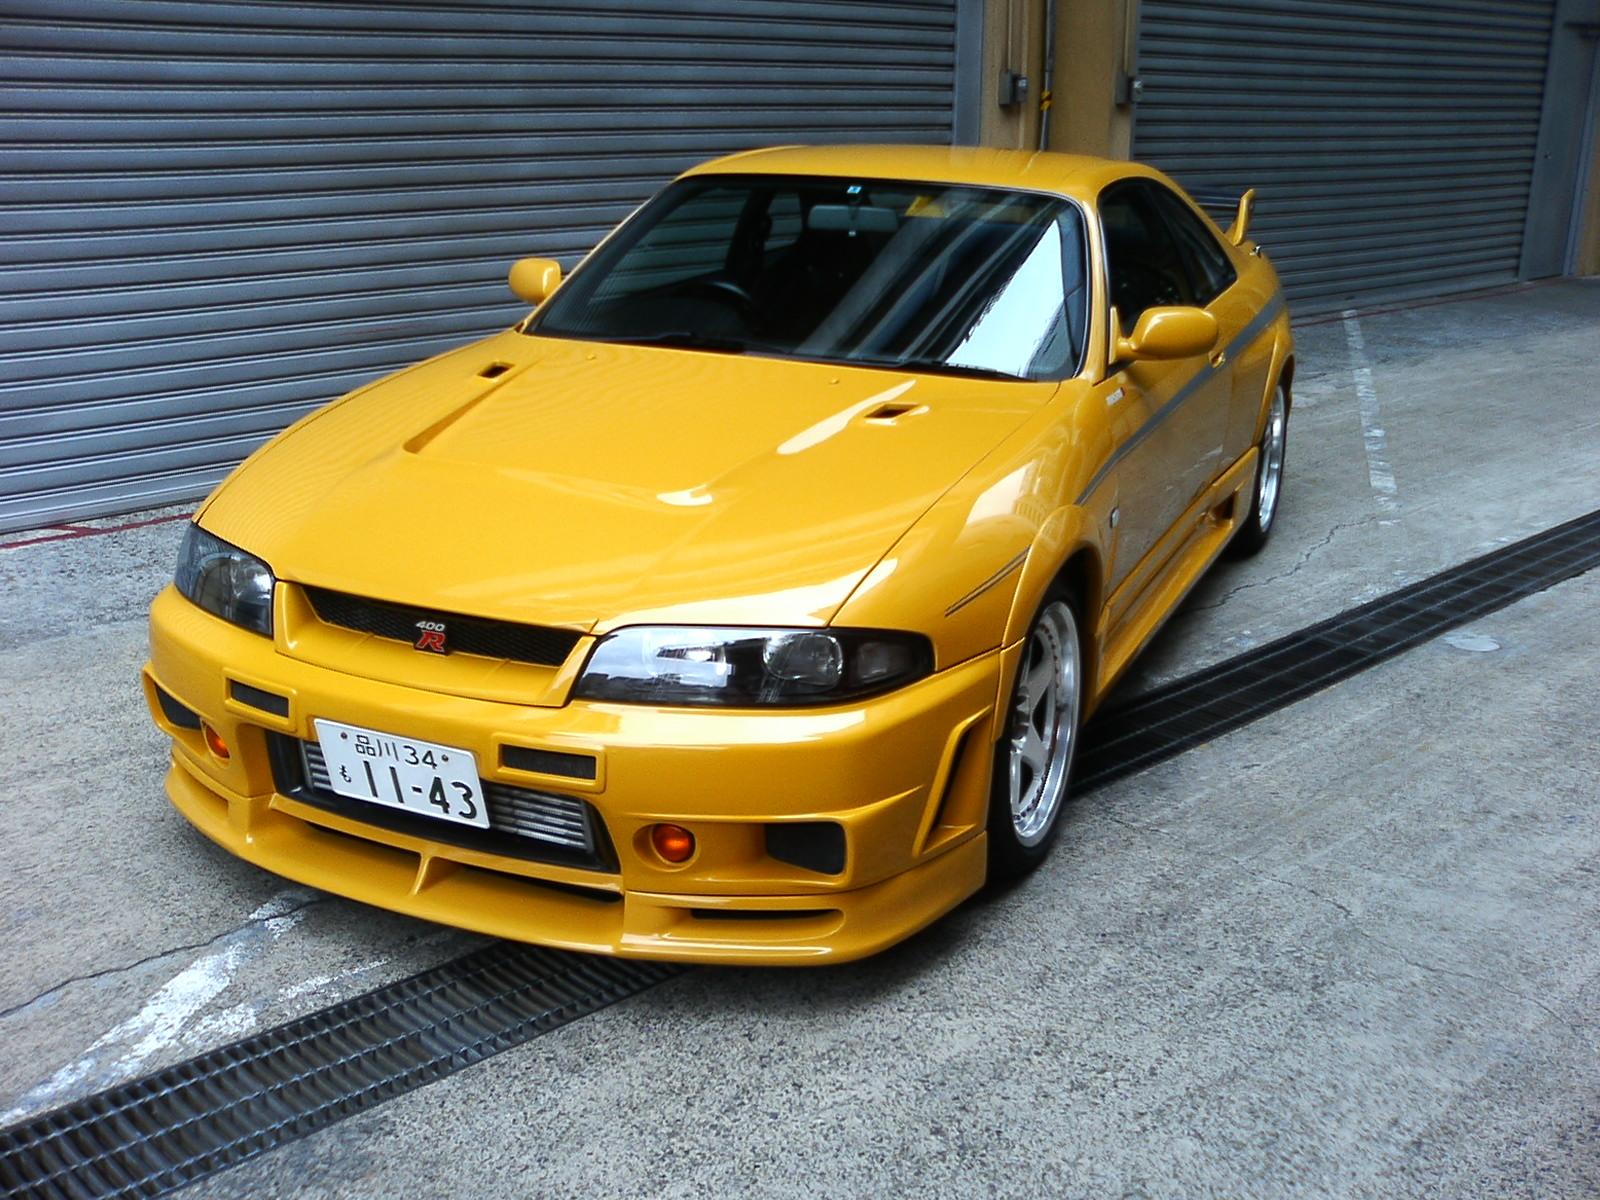 270R Parts n Stuff - Page 2 - Nissan Forum | Nissan Forums